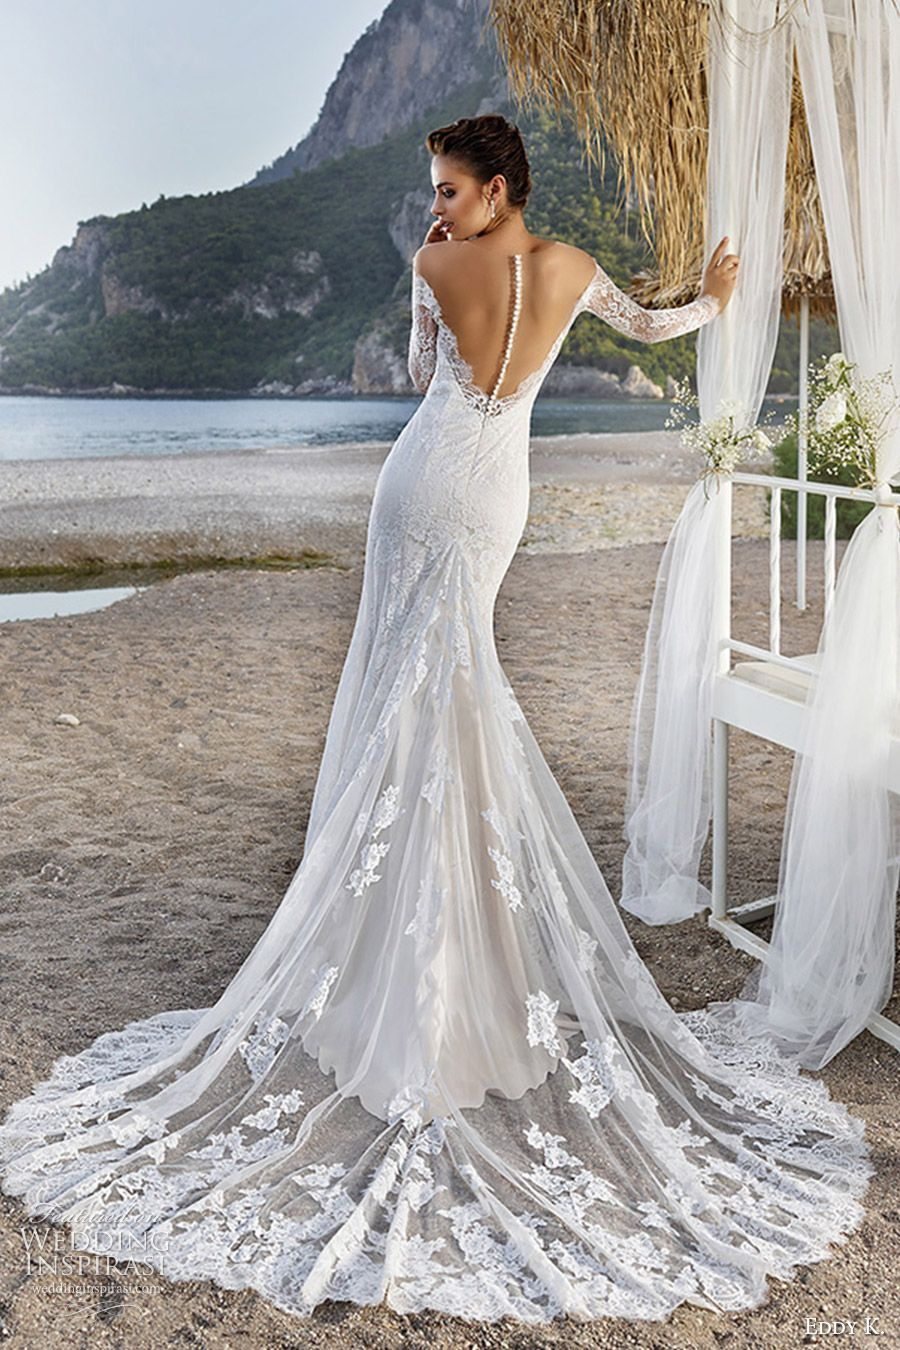 1fb4cc20e513 eddy k bridal 2017 long sleeves sweetheart off shoulder lace sheath wedding  dress (bali) bv illusion back train elegant